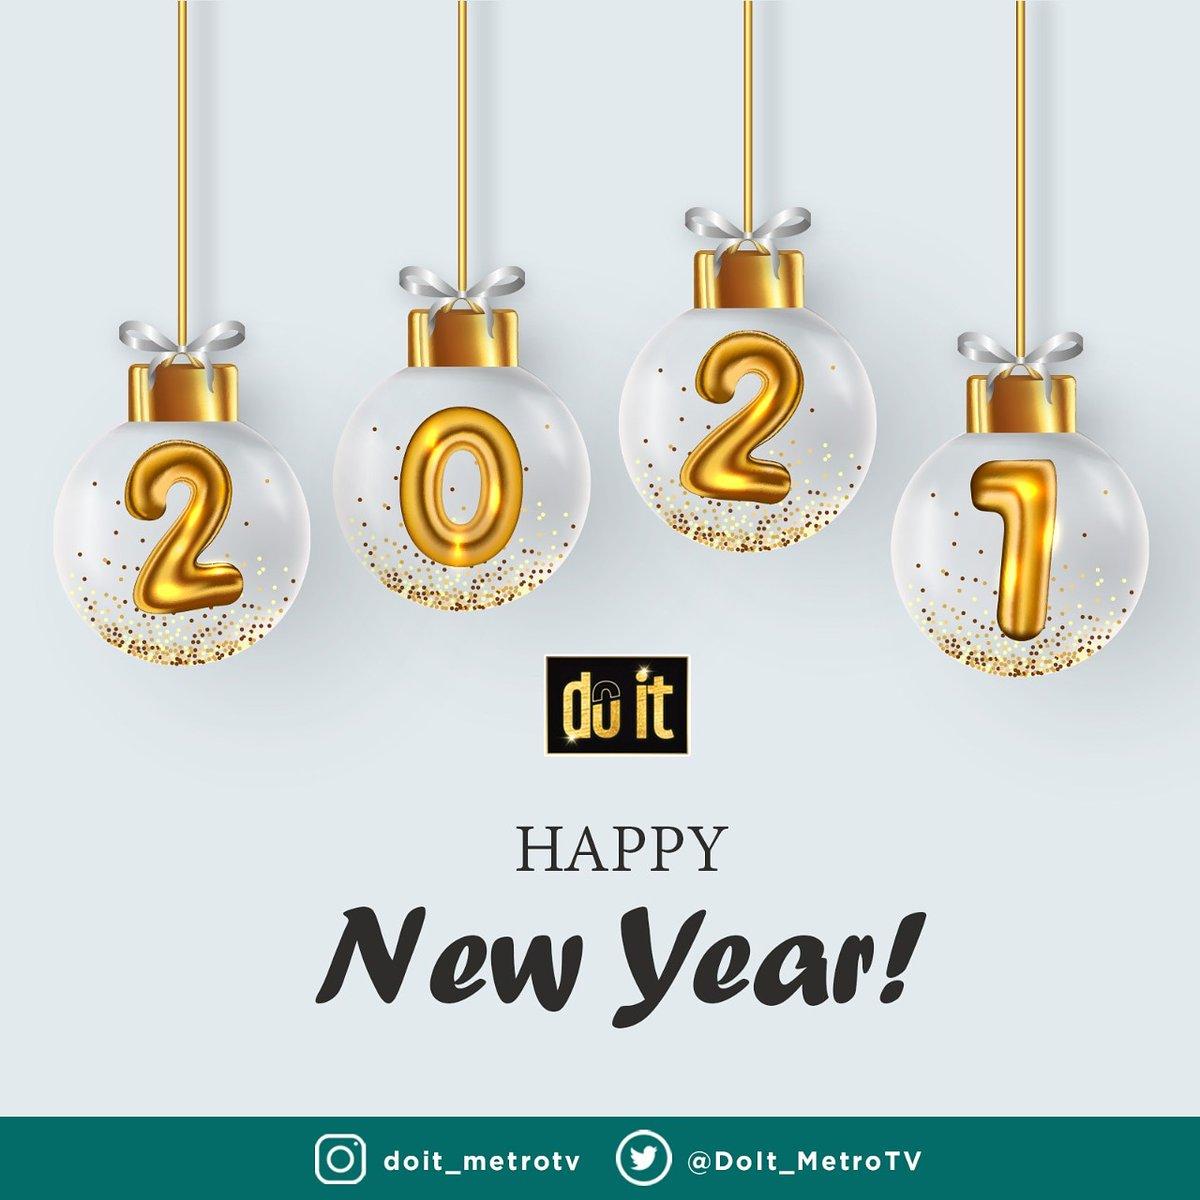 2020 menjadi tahun yang sulit untuk kita semua, kini tahun tersebut telah berlalu. Semoga di tahun 2021 ini kita semua dapat bangkit dari kesulitan yang menerpa dan menjadi pribadi yang lebih baik lagi serta sukses untuk ke depannya. Aamiin...🤩  Selamat Tahun Baru 2021. 🙌